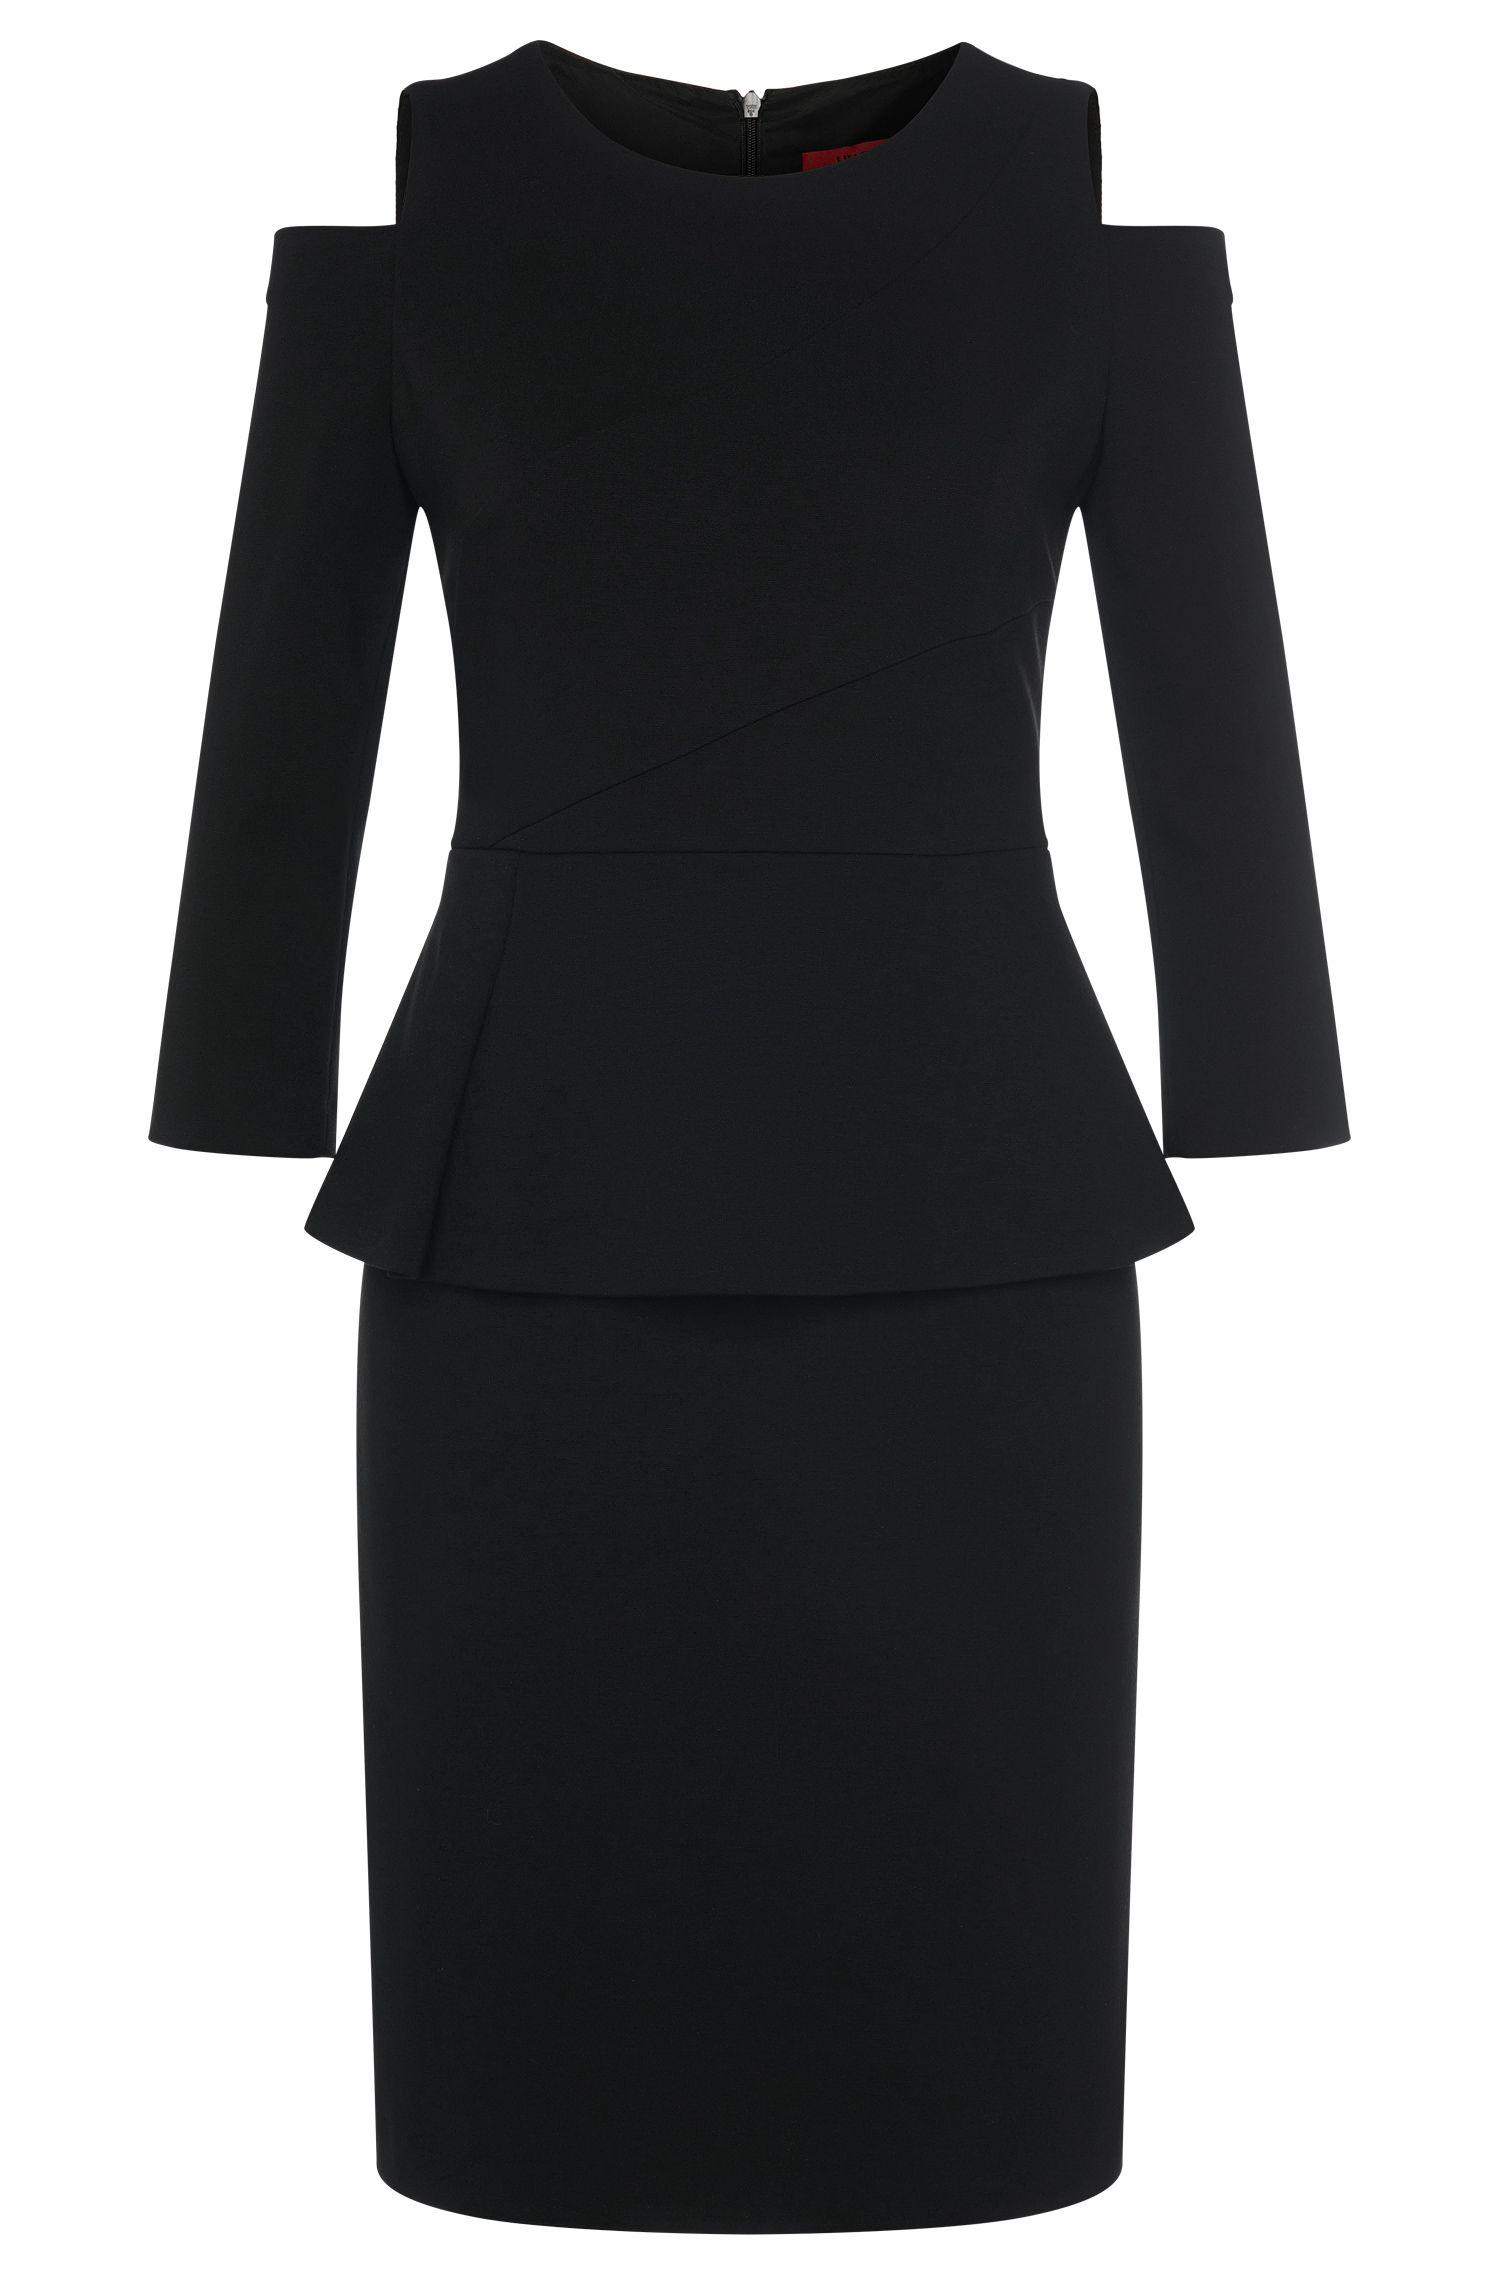 'Kepina' | Stretch Viscose Peplum Sheath Dress